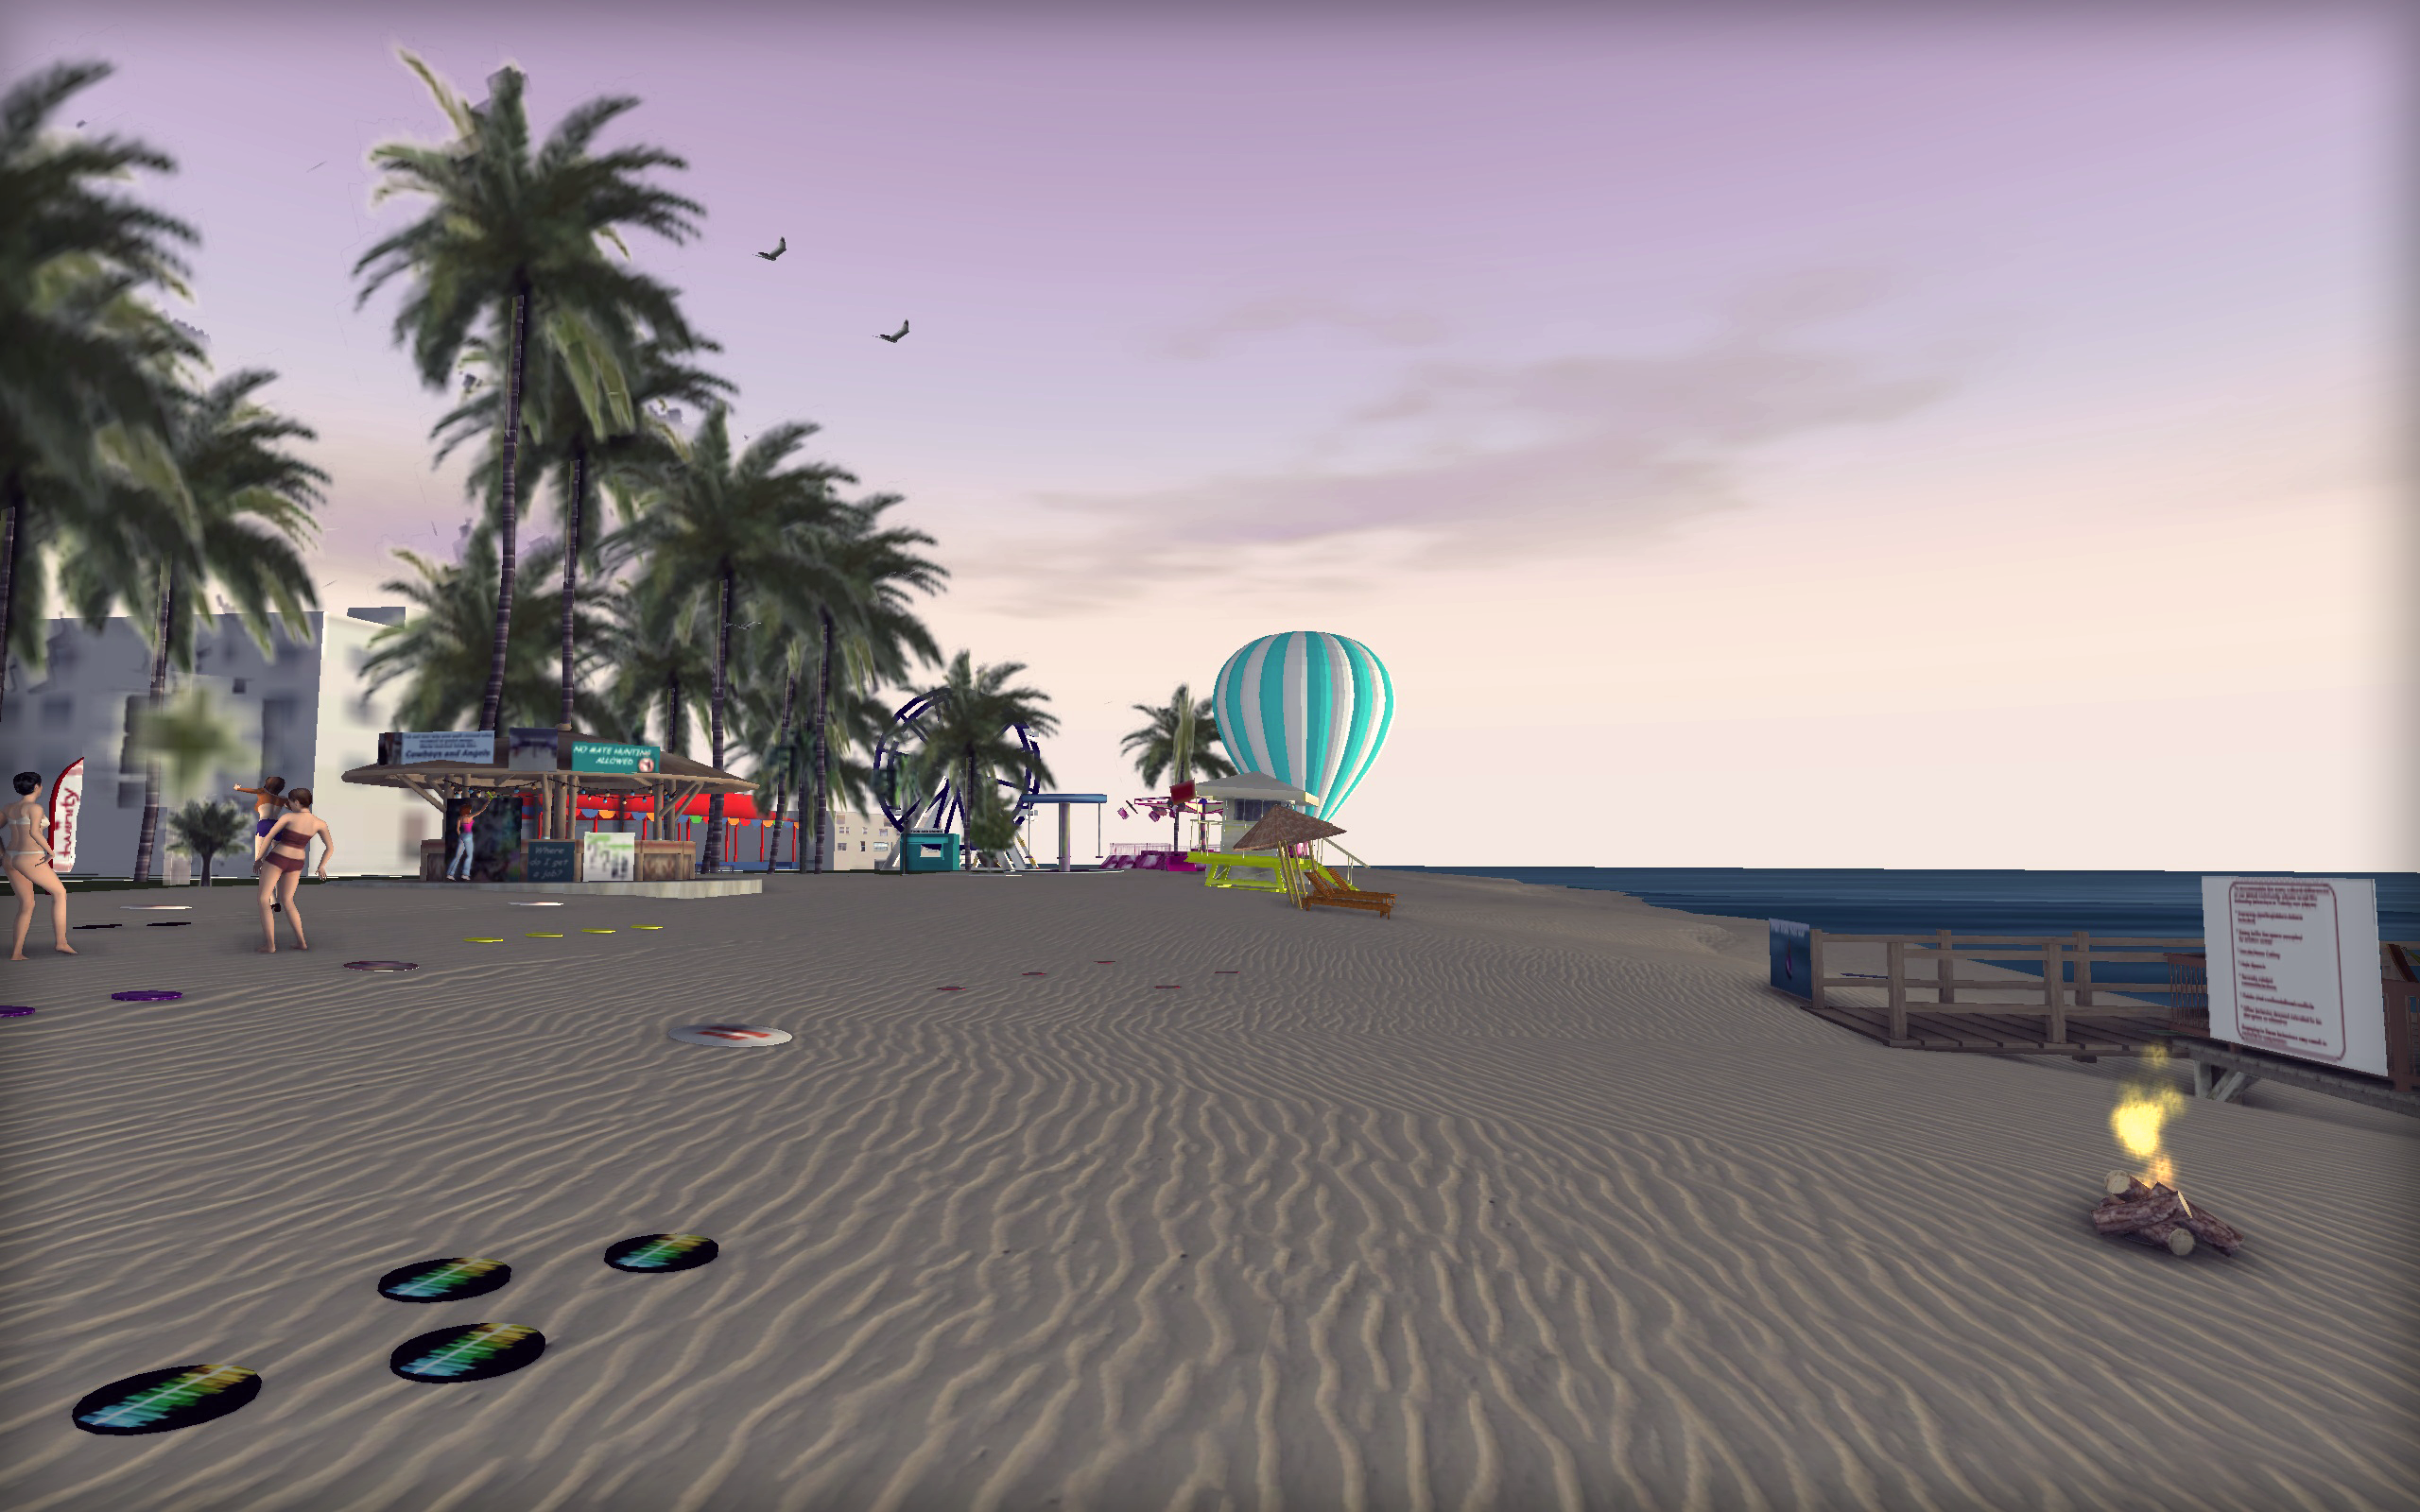 3DMiami Beach Img 3